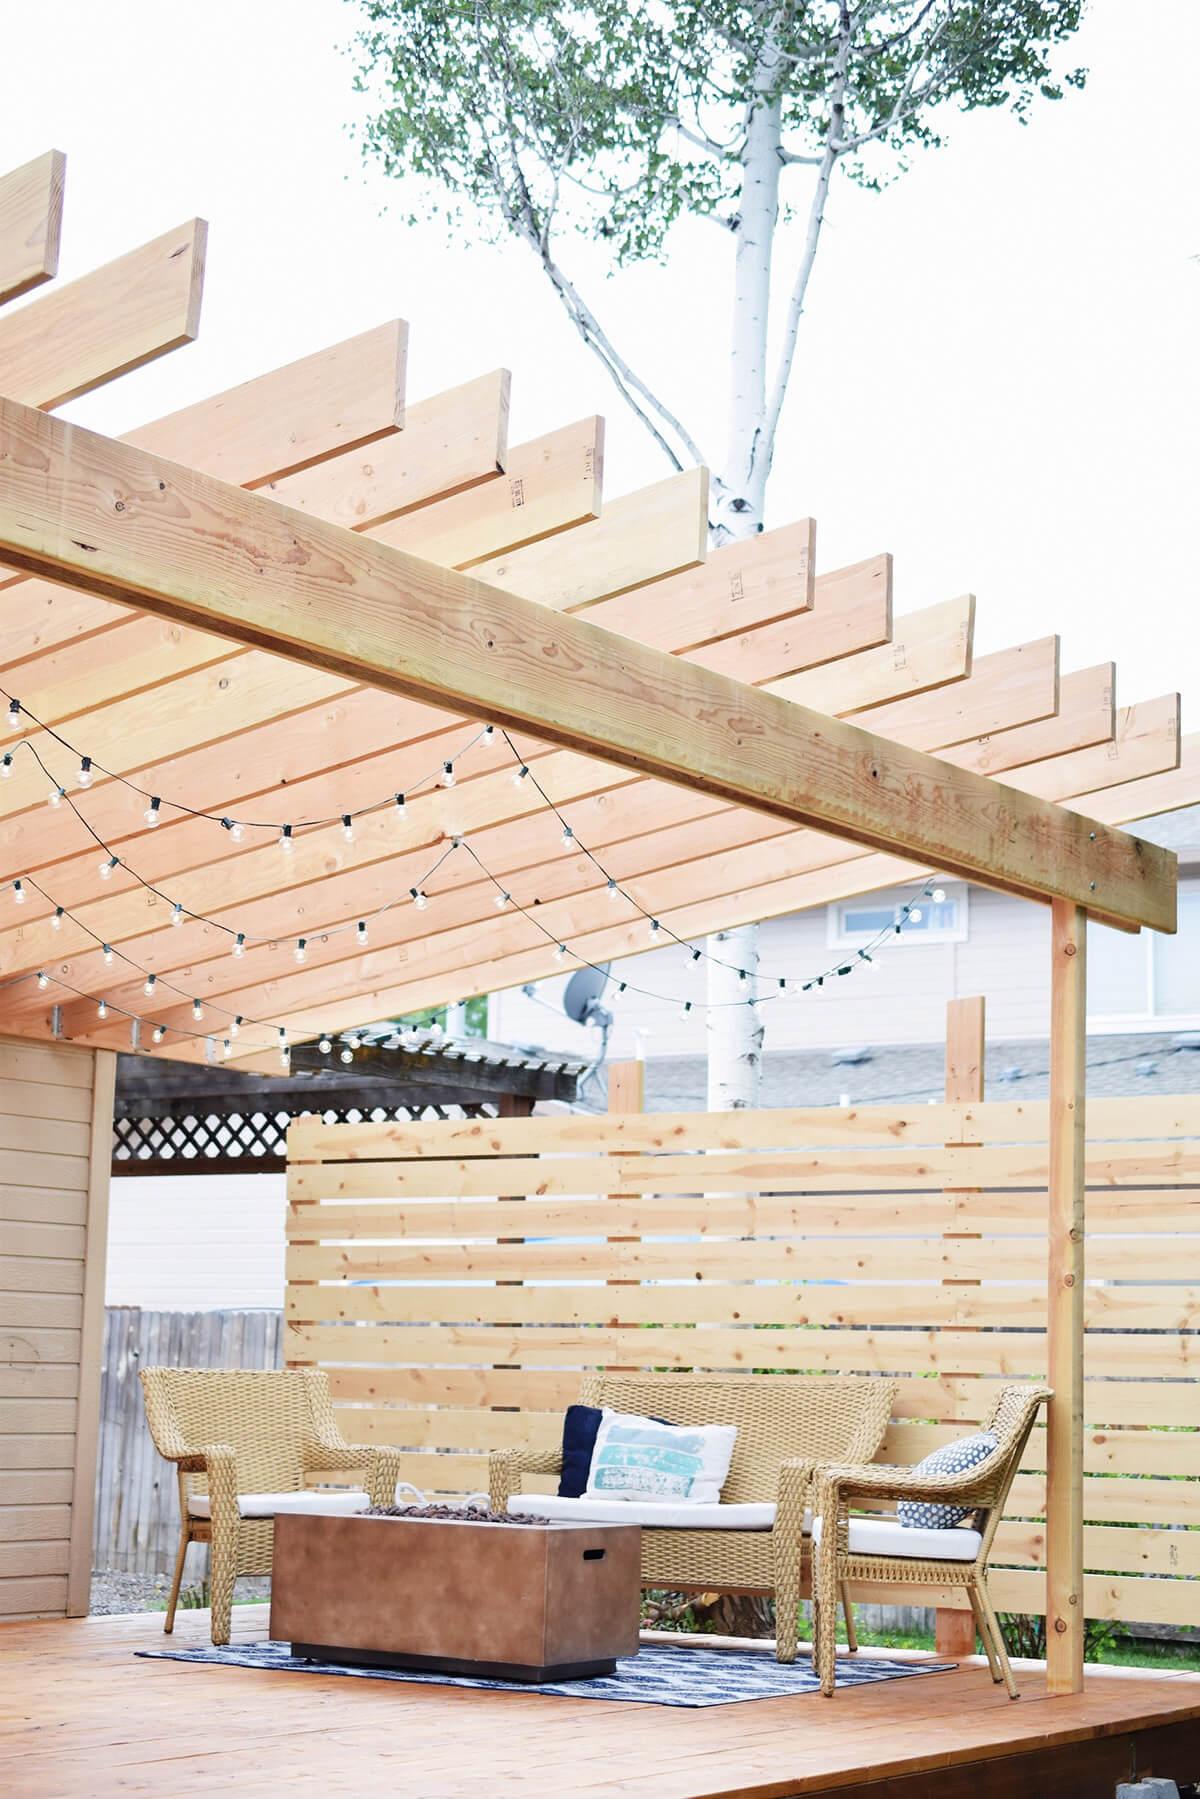 Amphitheater Patio Deck for an Incredible Outdoor Retreat